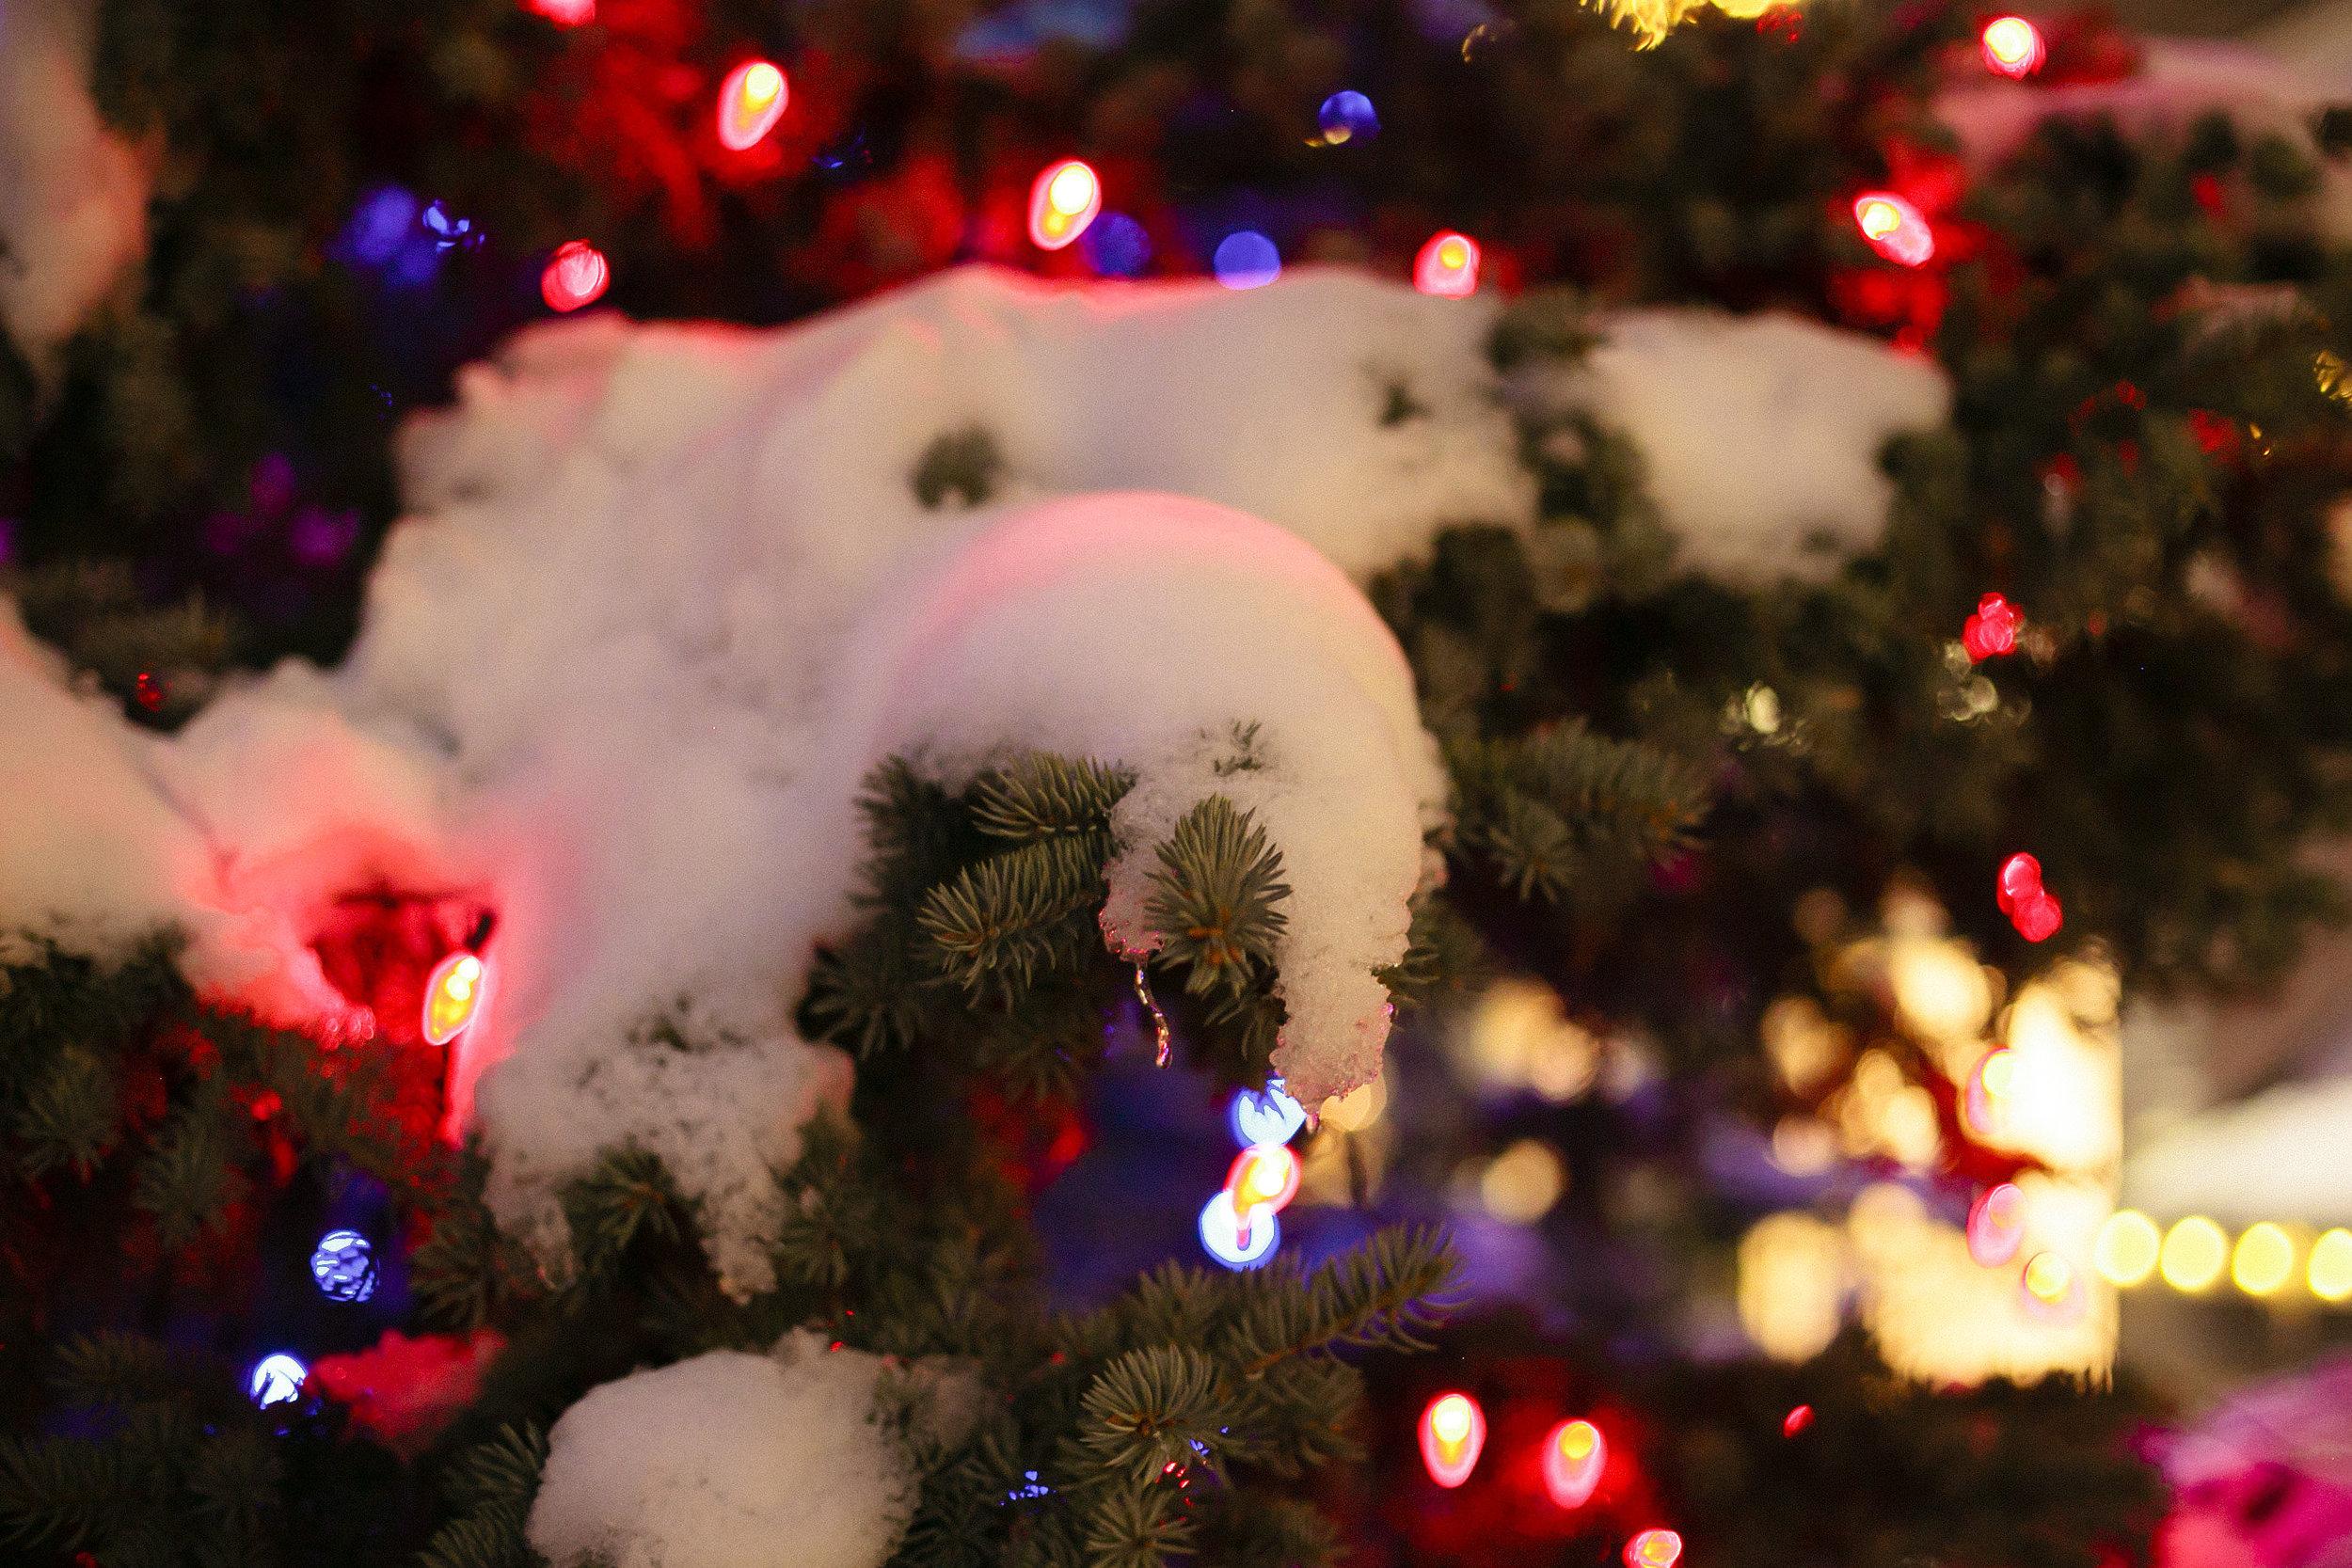 201612_christkindlmarkt32.jpg